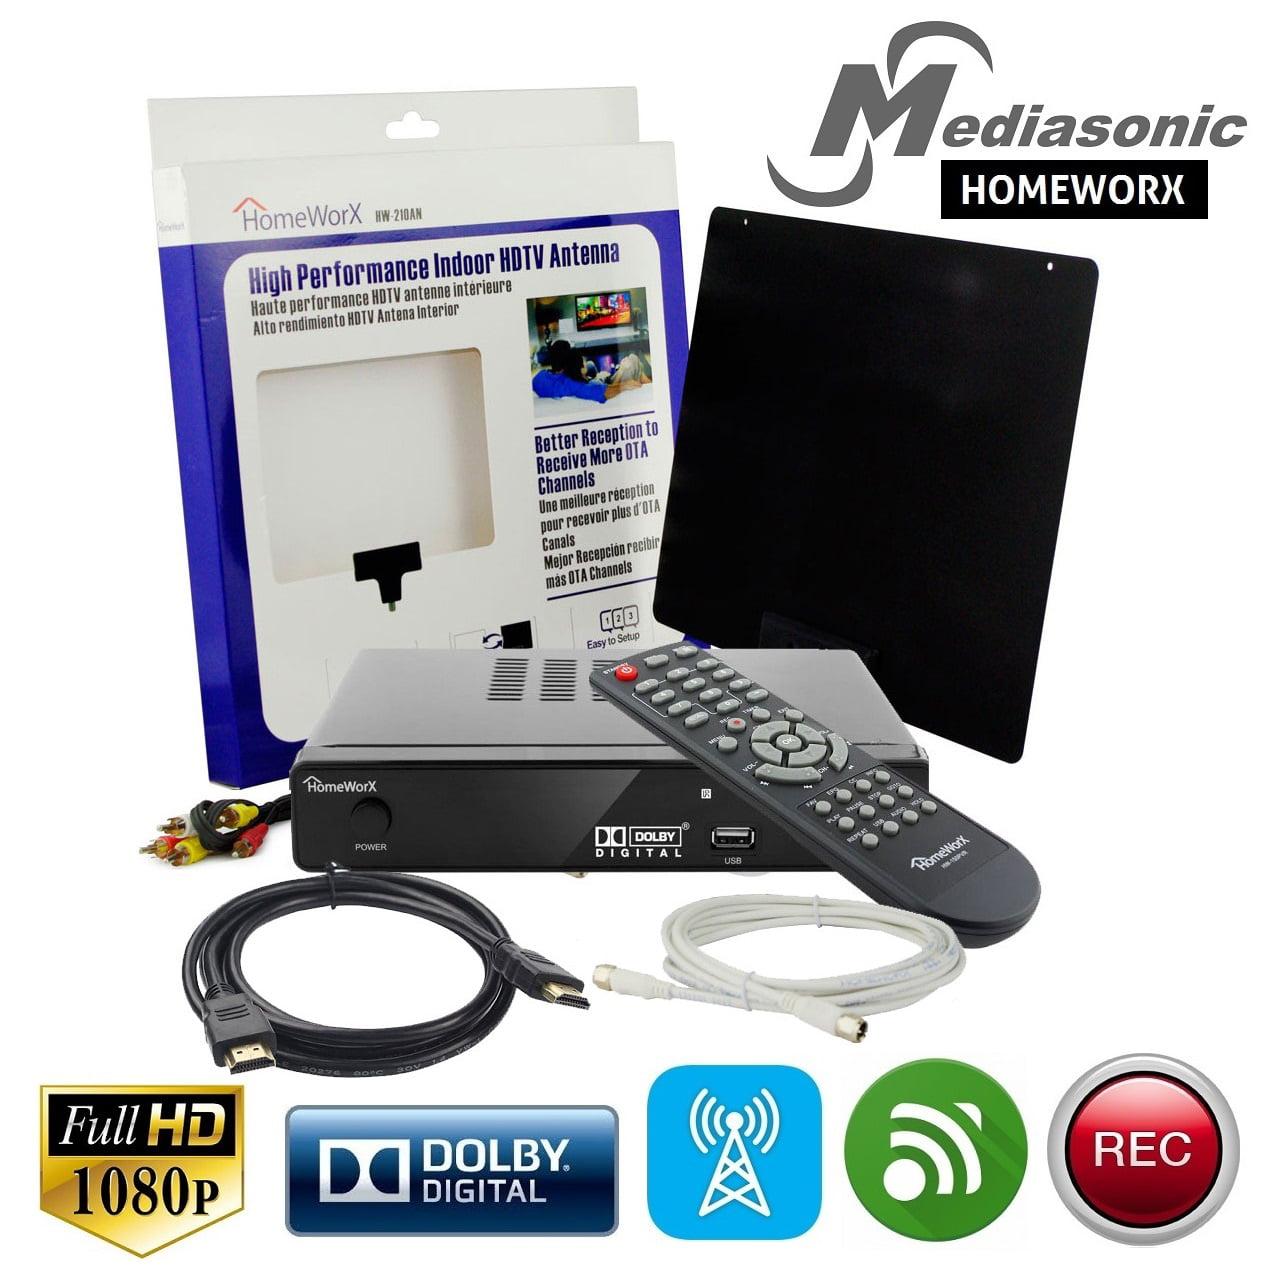 Mediasonic HOMEWORX HW155PVRA HDTV Converter Box w/ TV Tuner Recording, Media Player, Antenna, & HDMI Cable